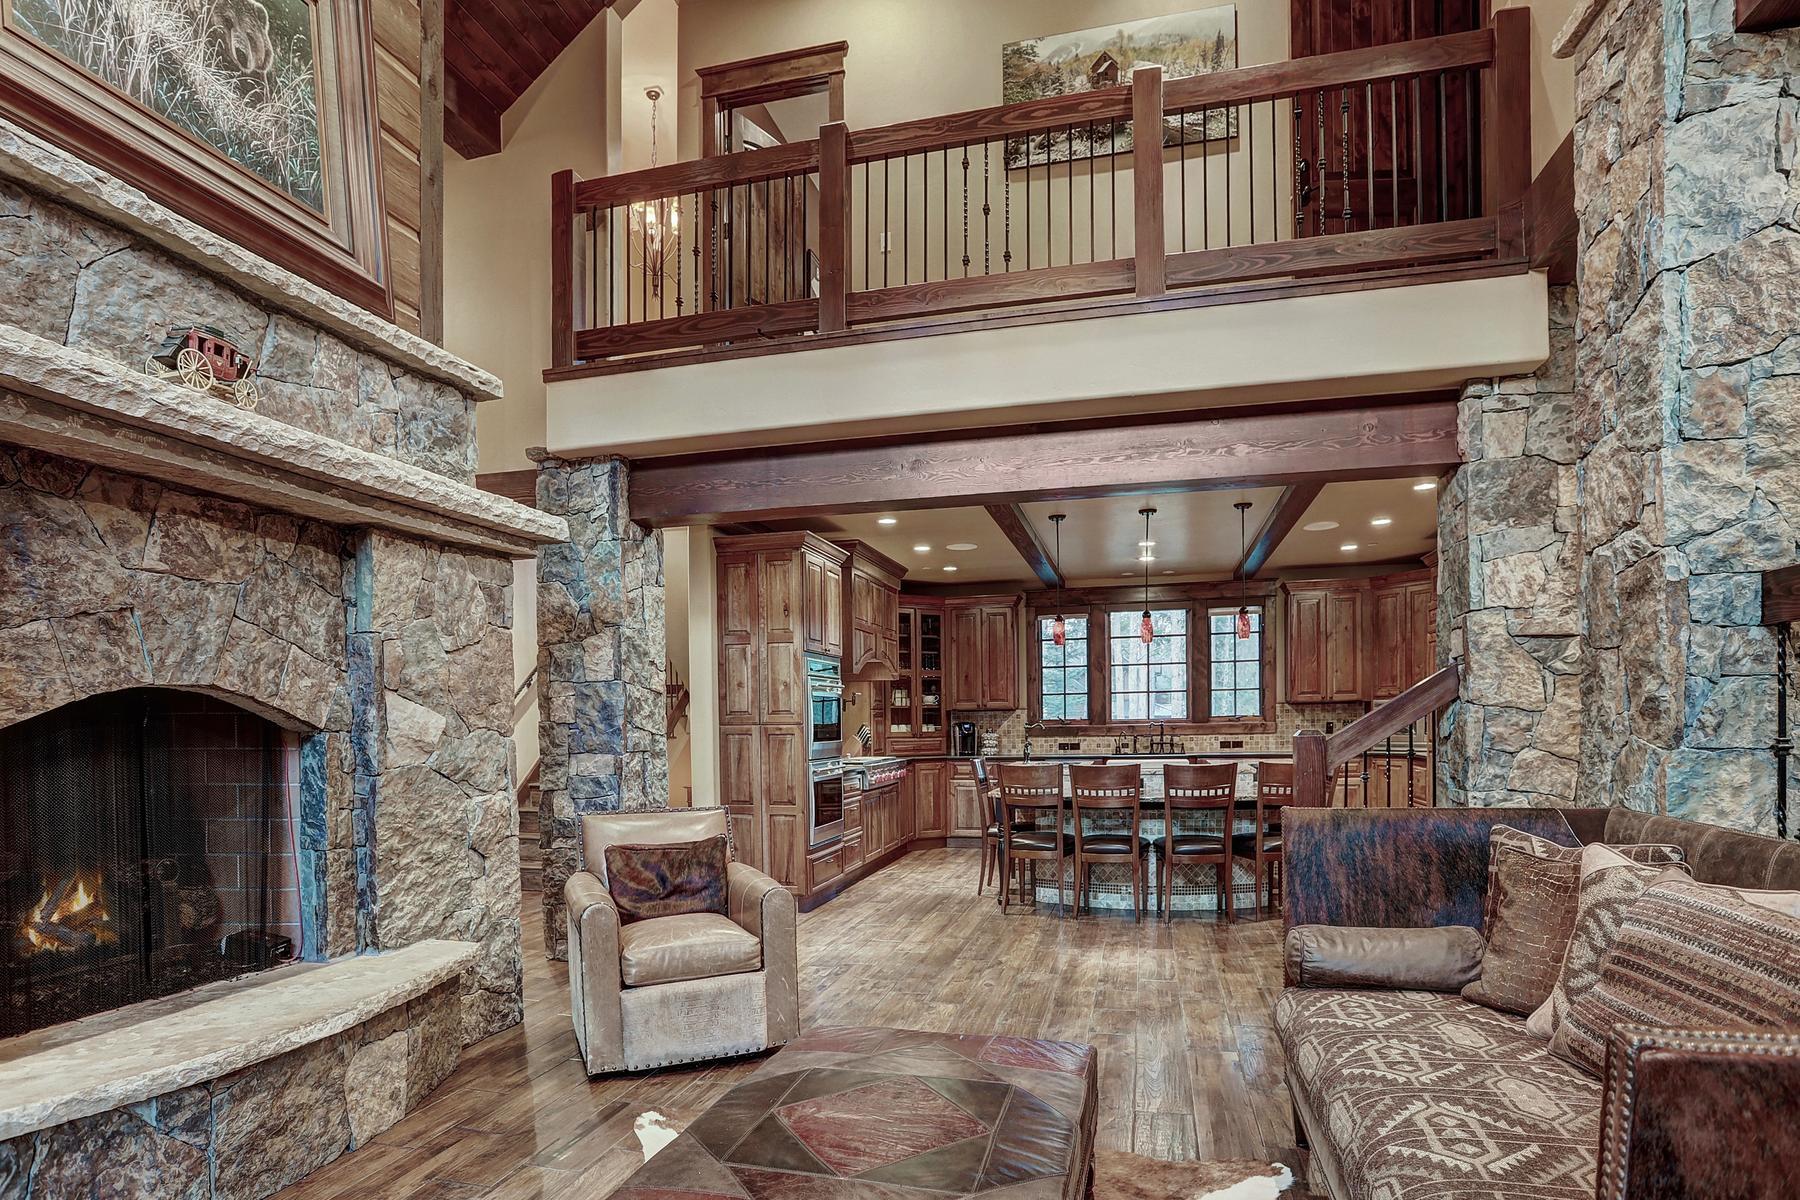 Additional photo for property listing at Glenwild Home 1296 Glenwild Drive Breckenridge, Colorado 80424 United States